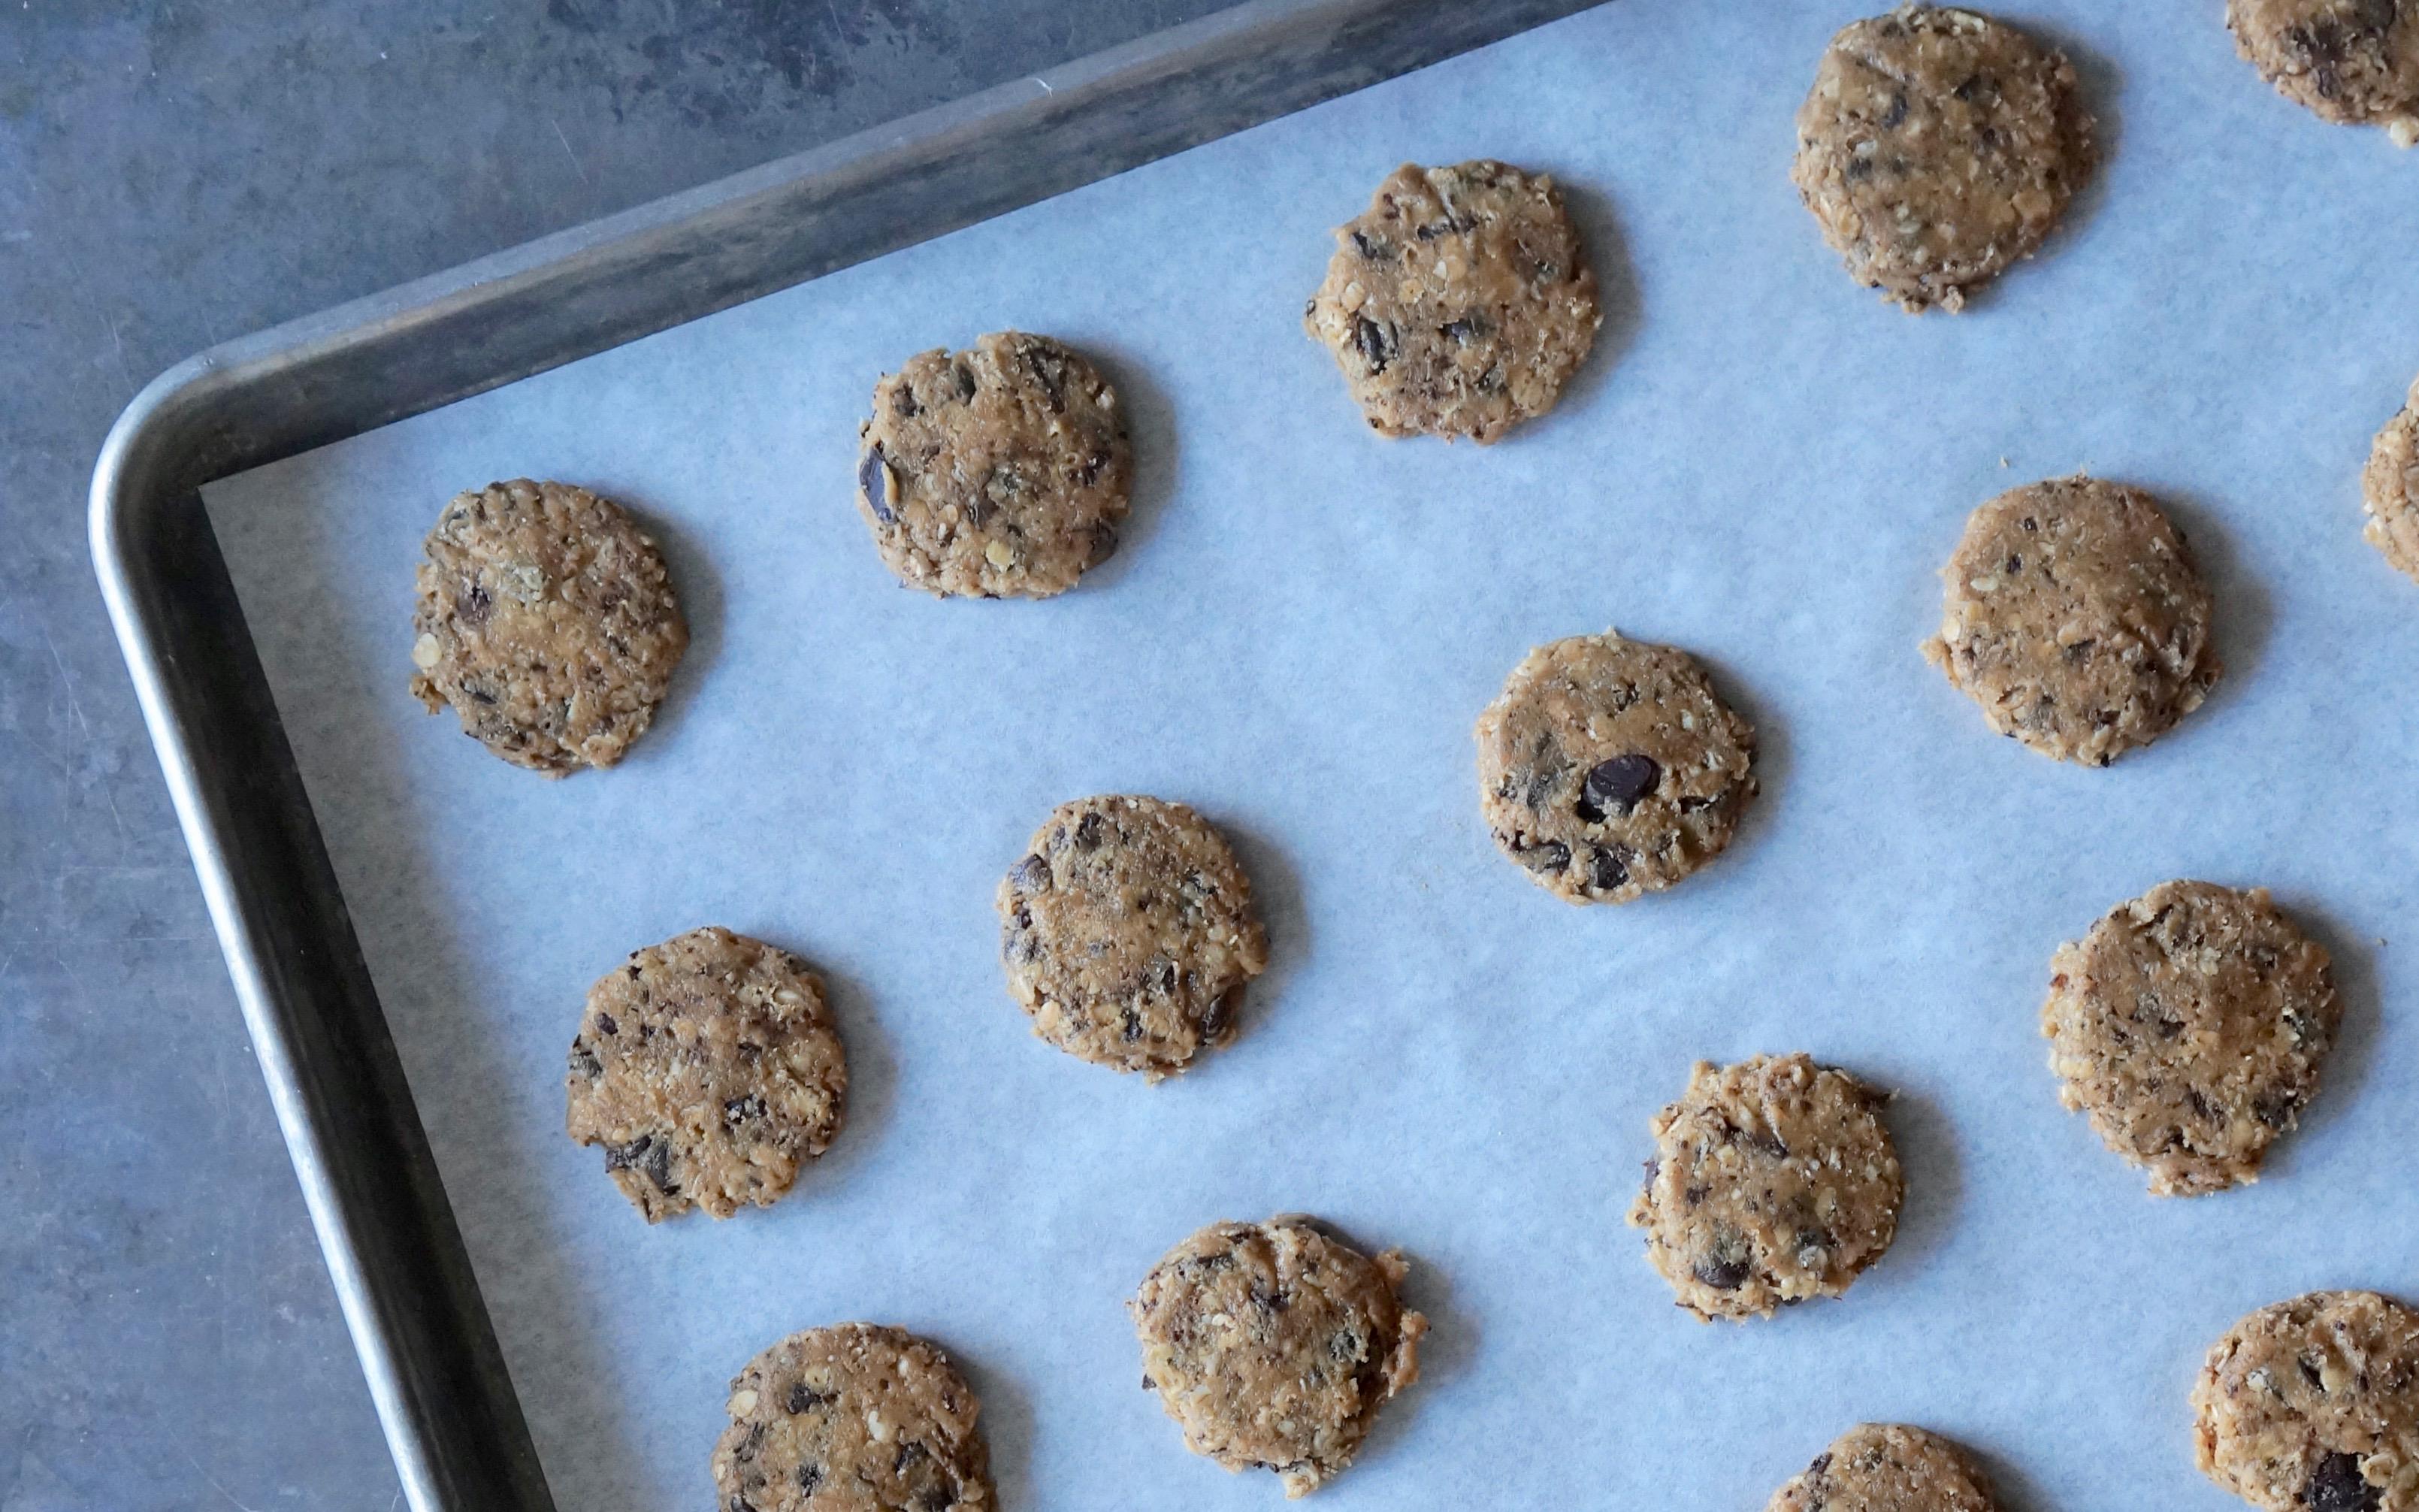 Chocolate-Chunk-Peanut-Butter-Oatmeal-Cookies-Rebecca-Gordon-Publisher-Buttermilk-Lipstick-Culinary-Entertaining-Techniques-RebeccaGordon-Southern-Hostess-Pastry-Chef-Birmingham-Alabama